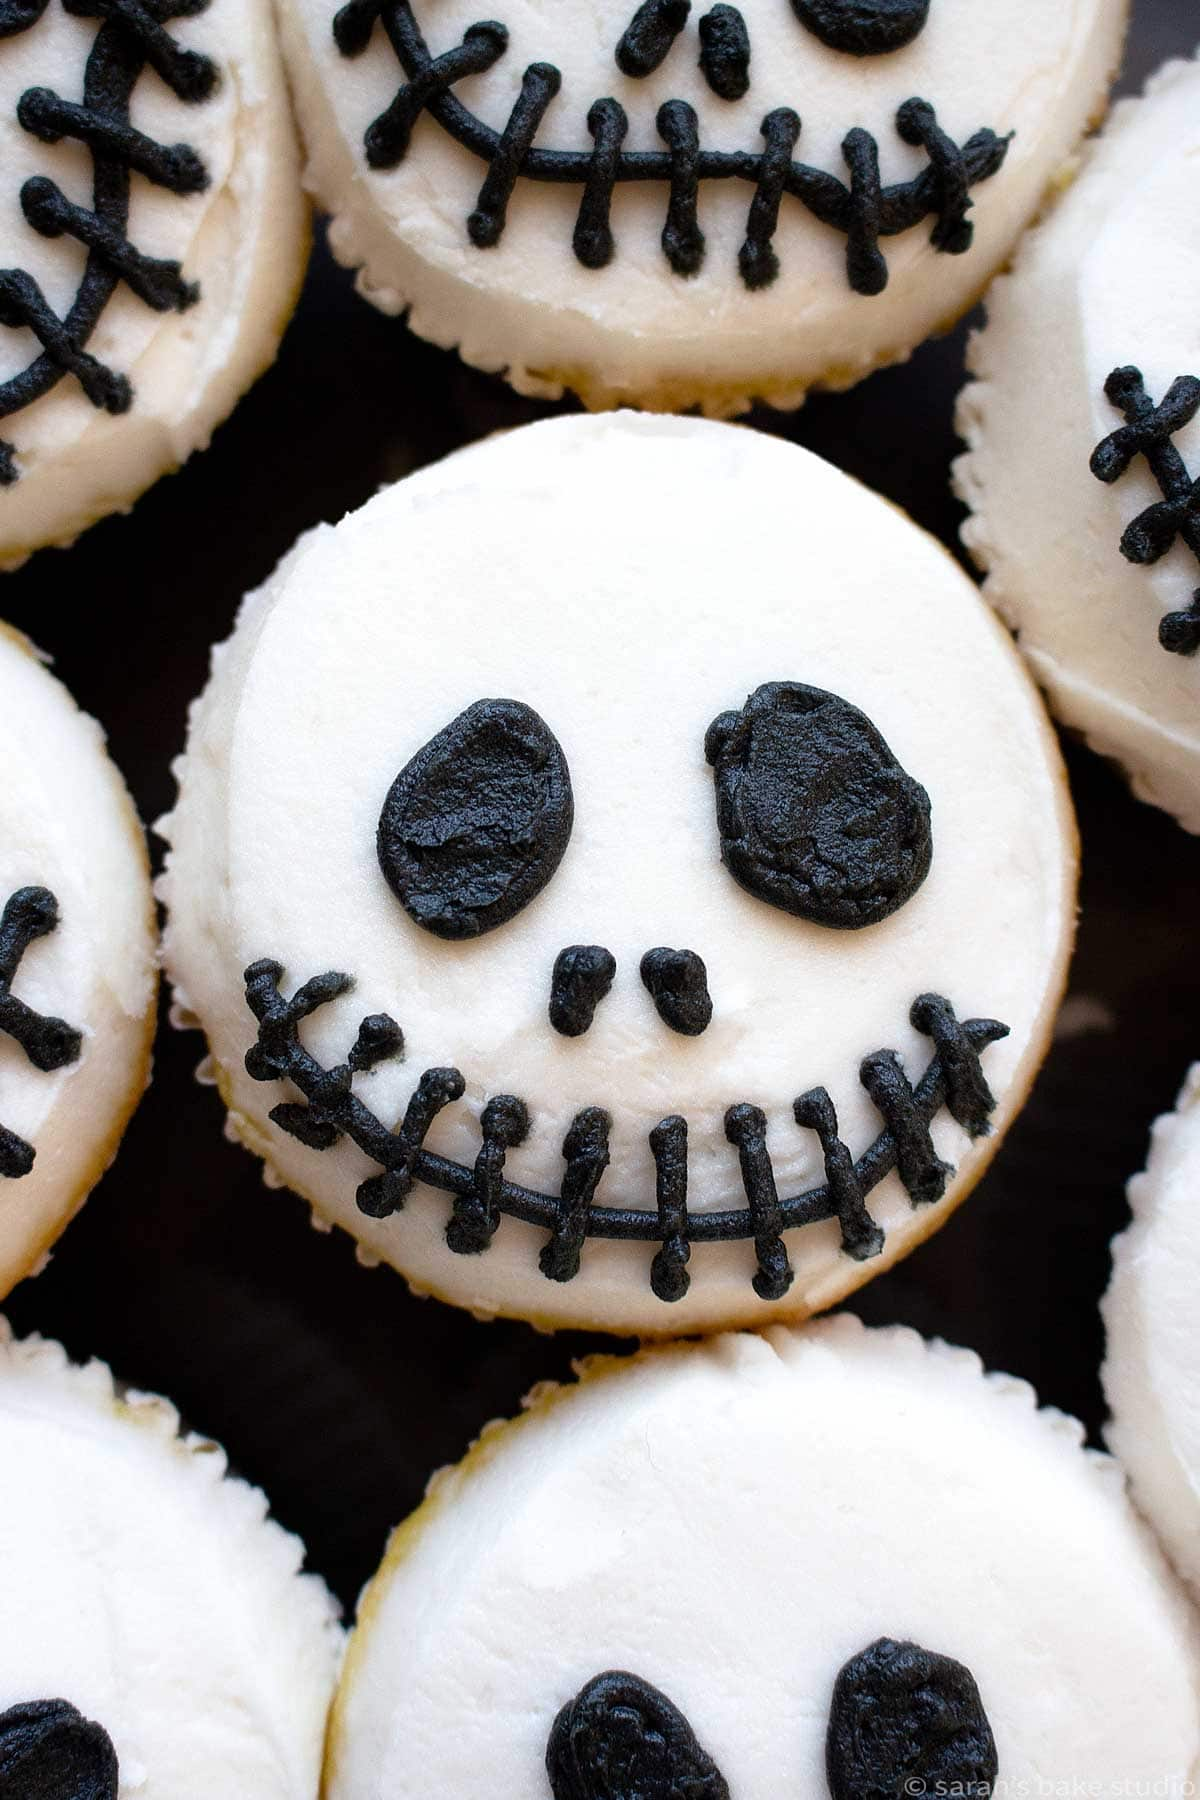 Jack Skeleton Cupcakes up-close.